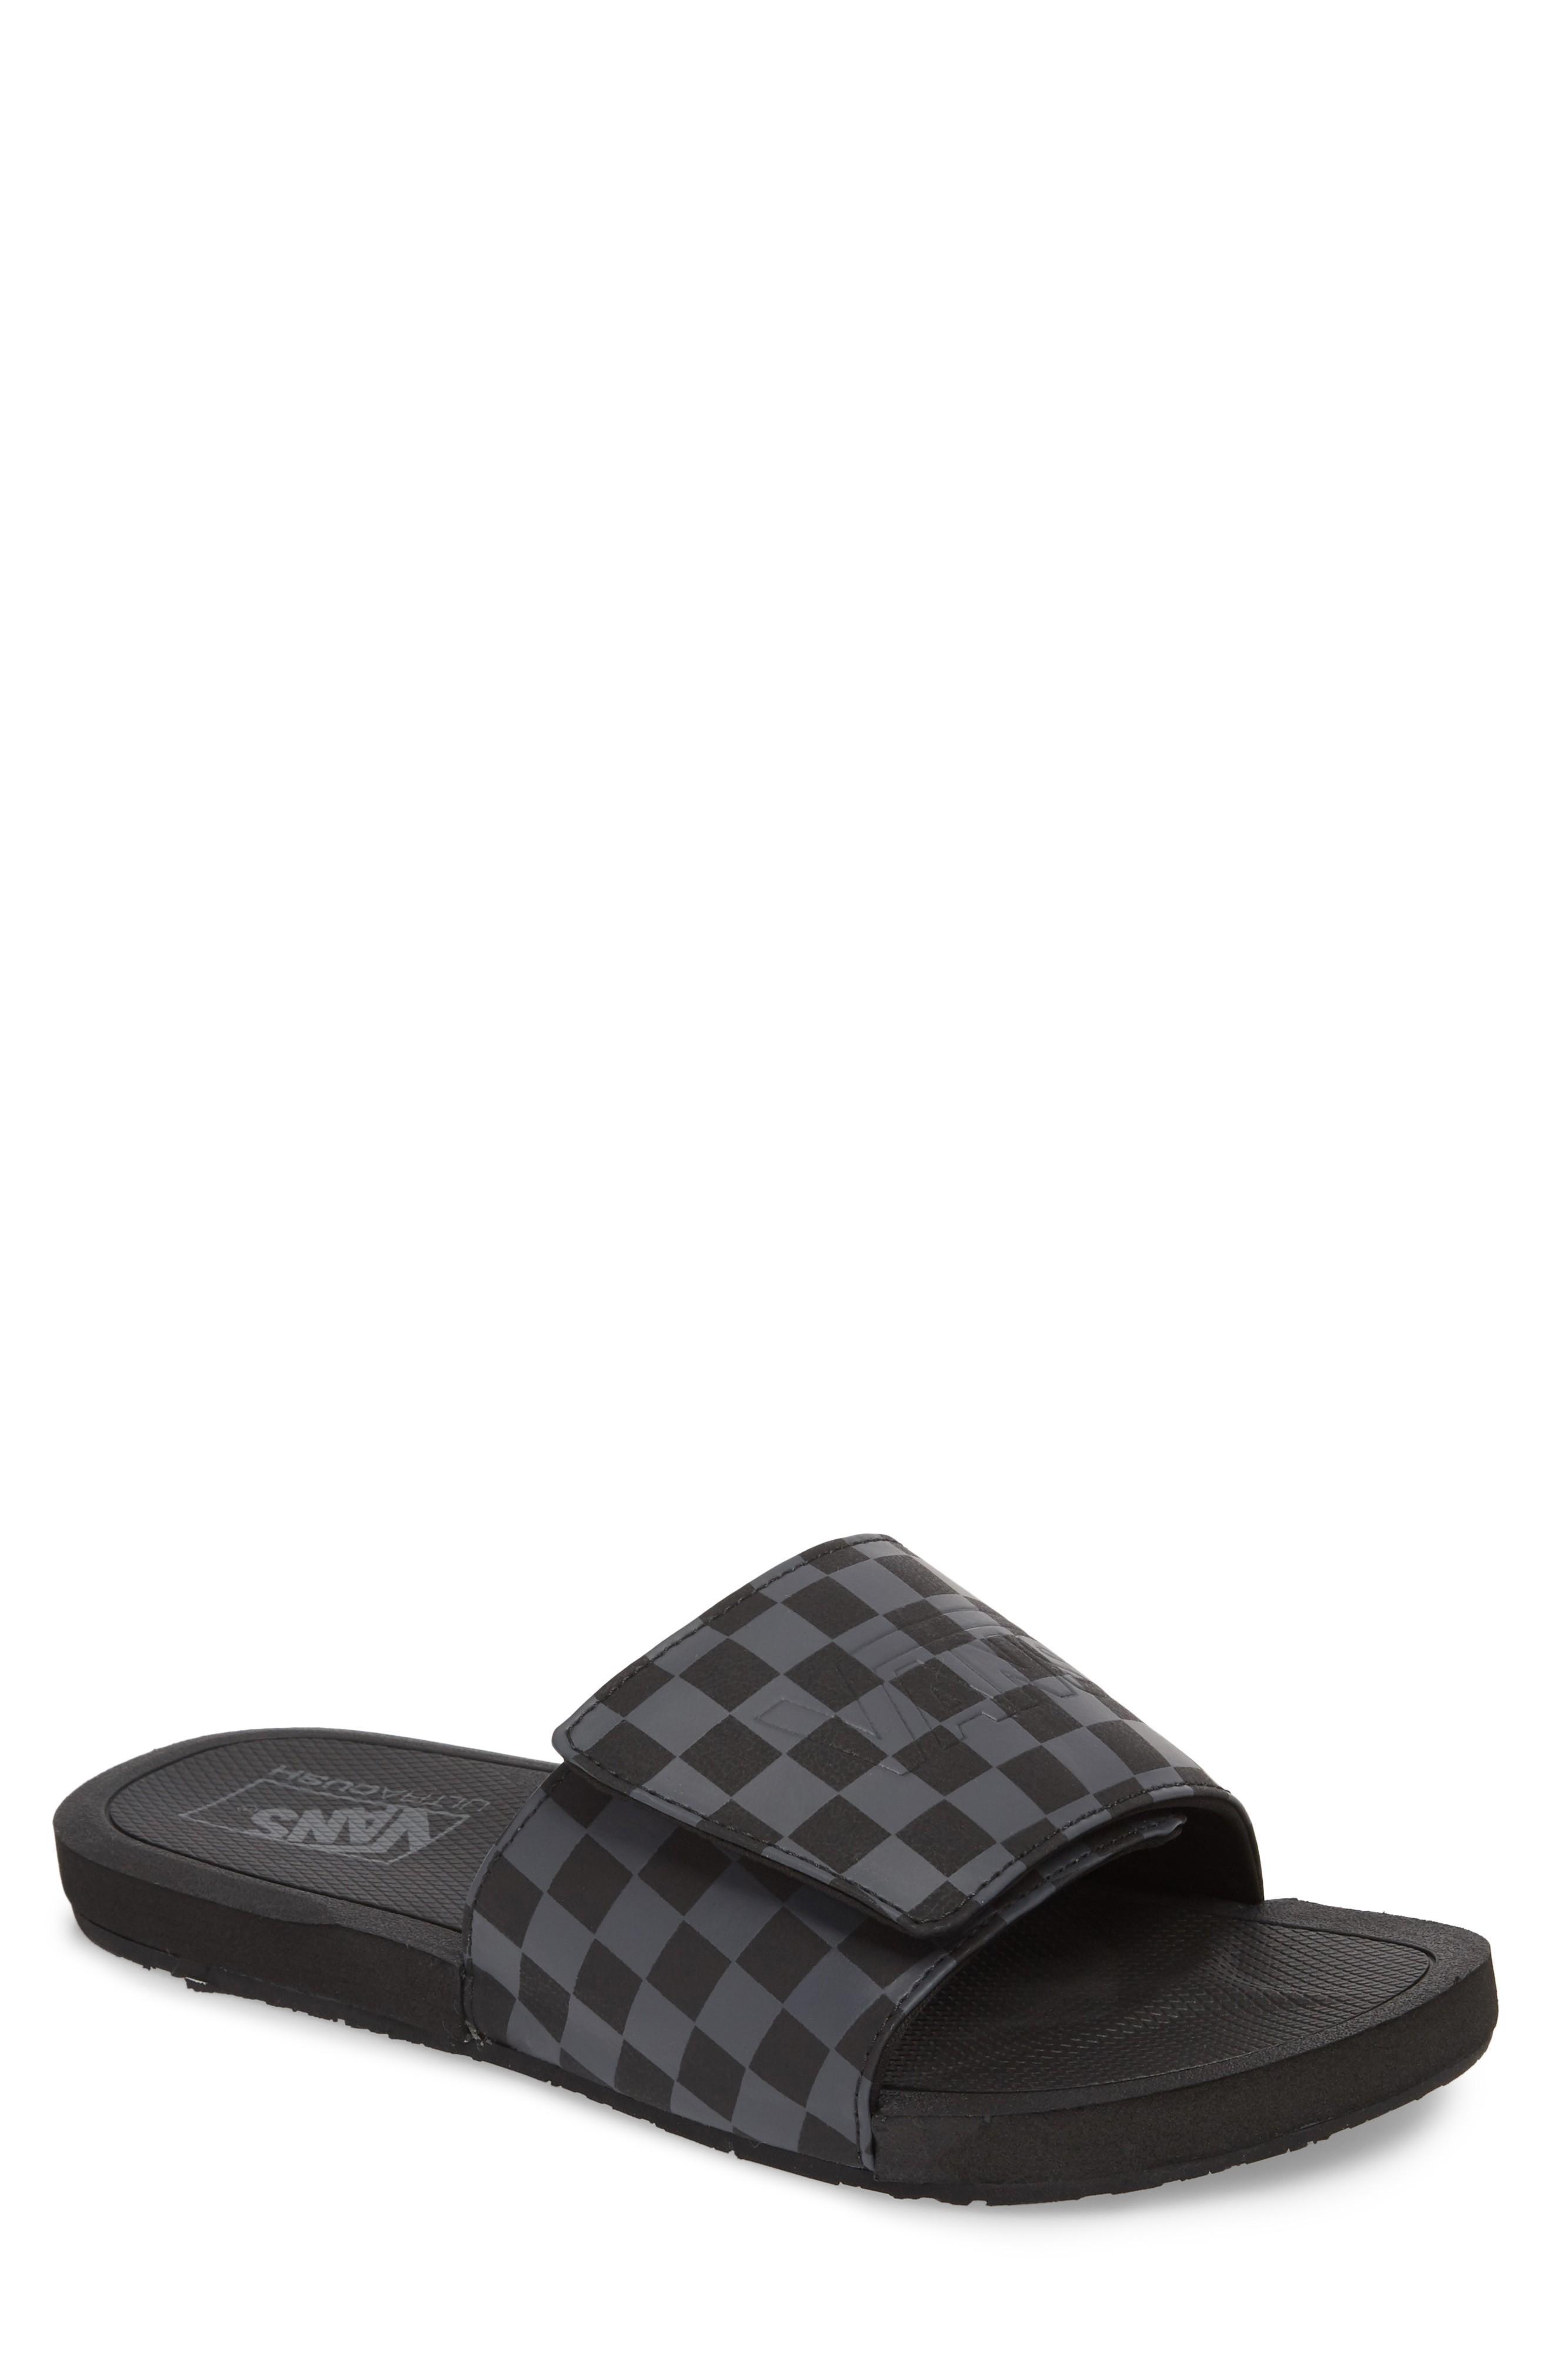 02a594ae85 Vans Nexpa Slide Sandal In Black  Asphalt